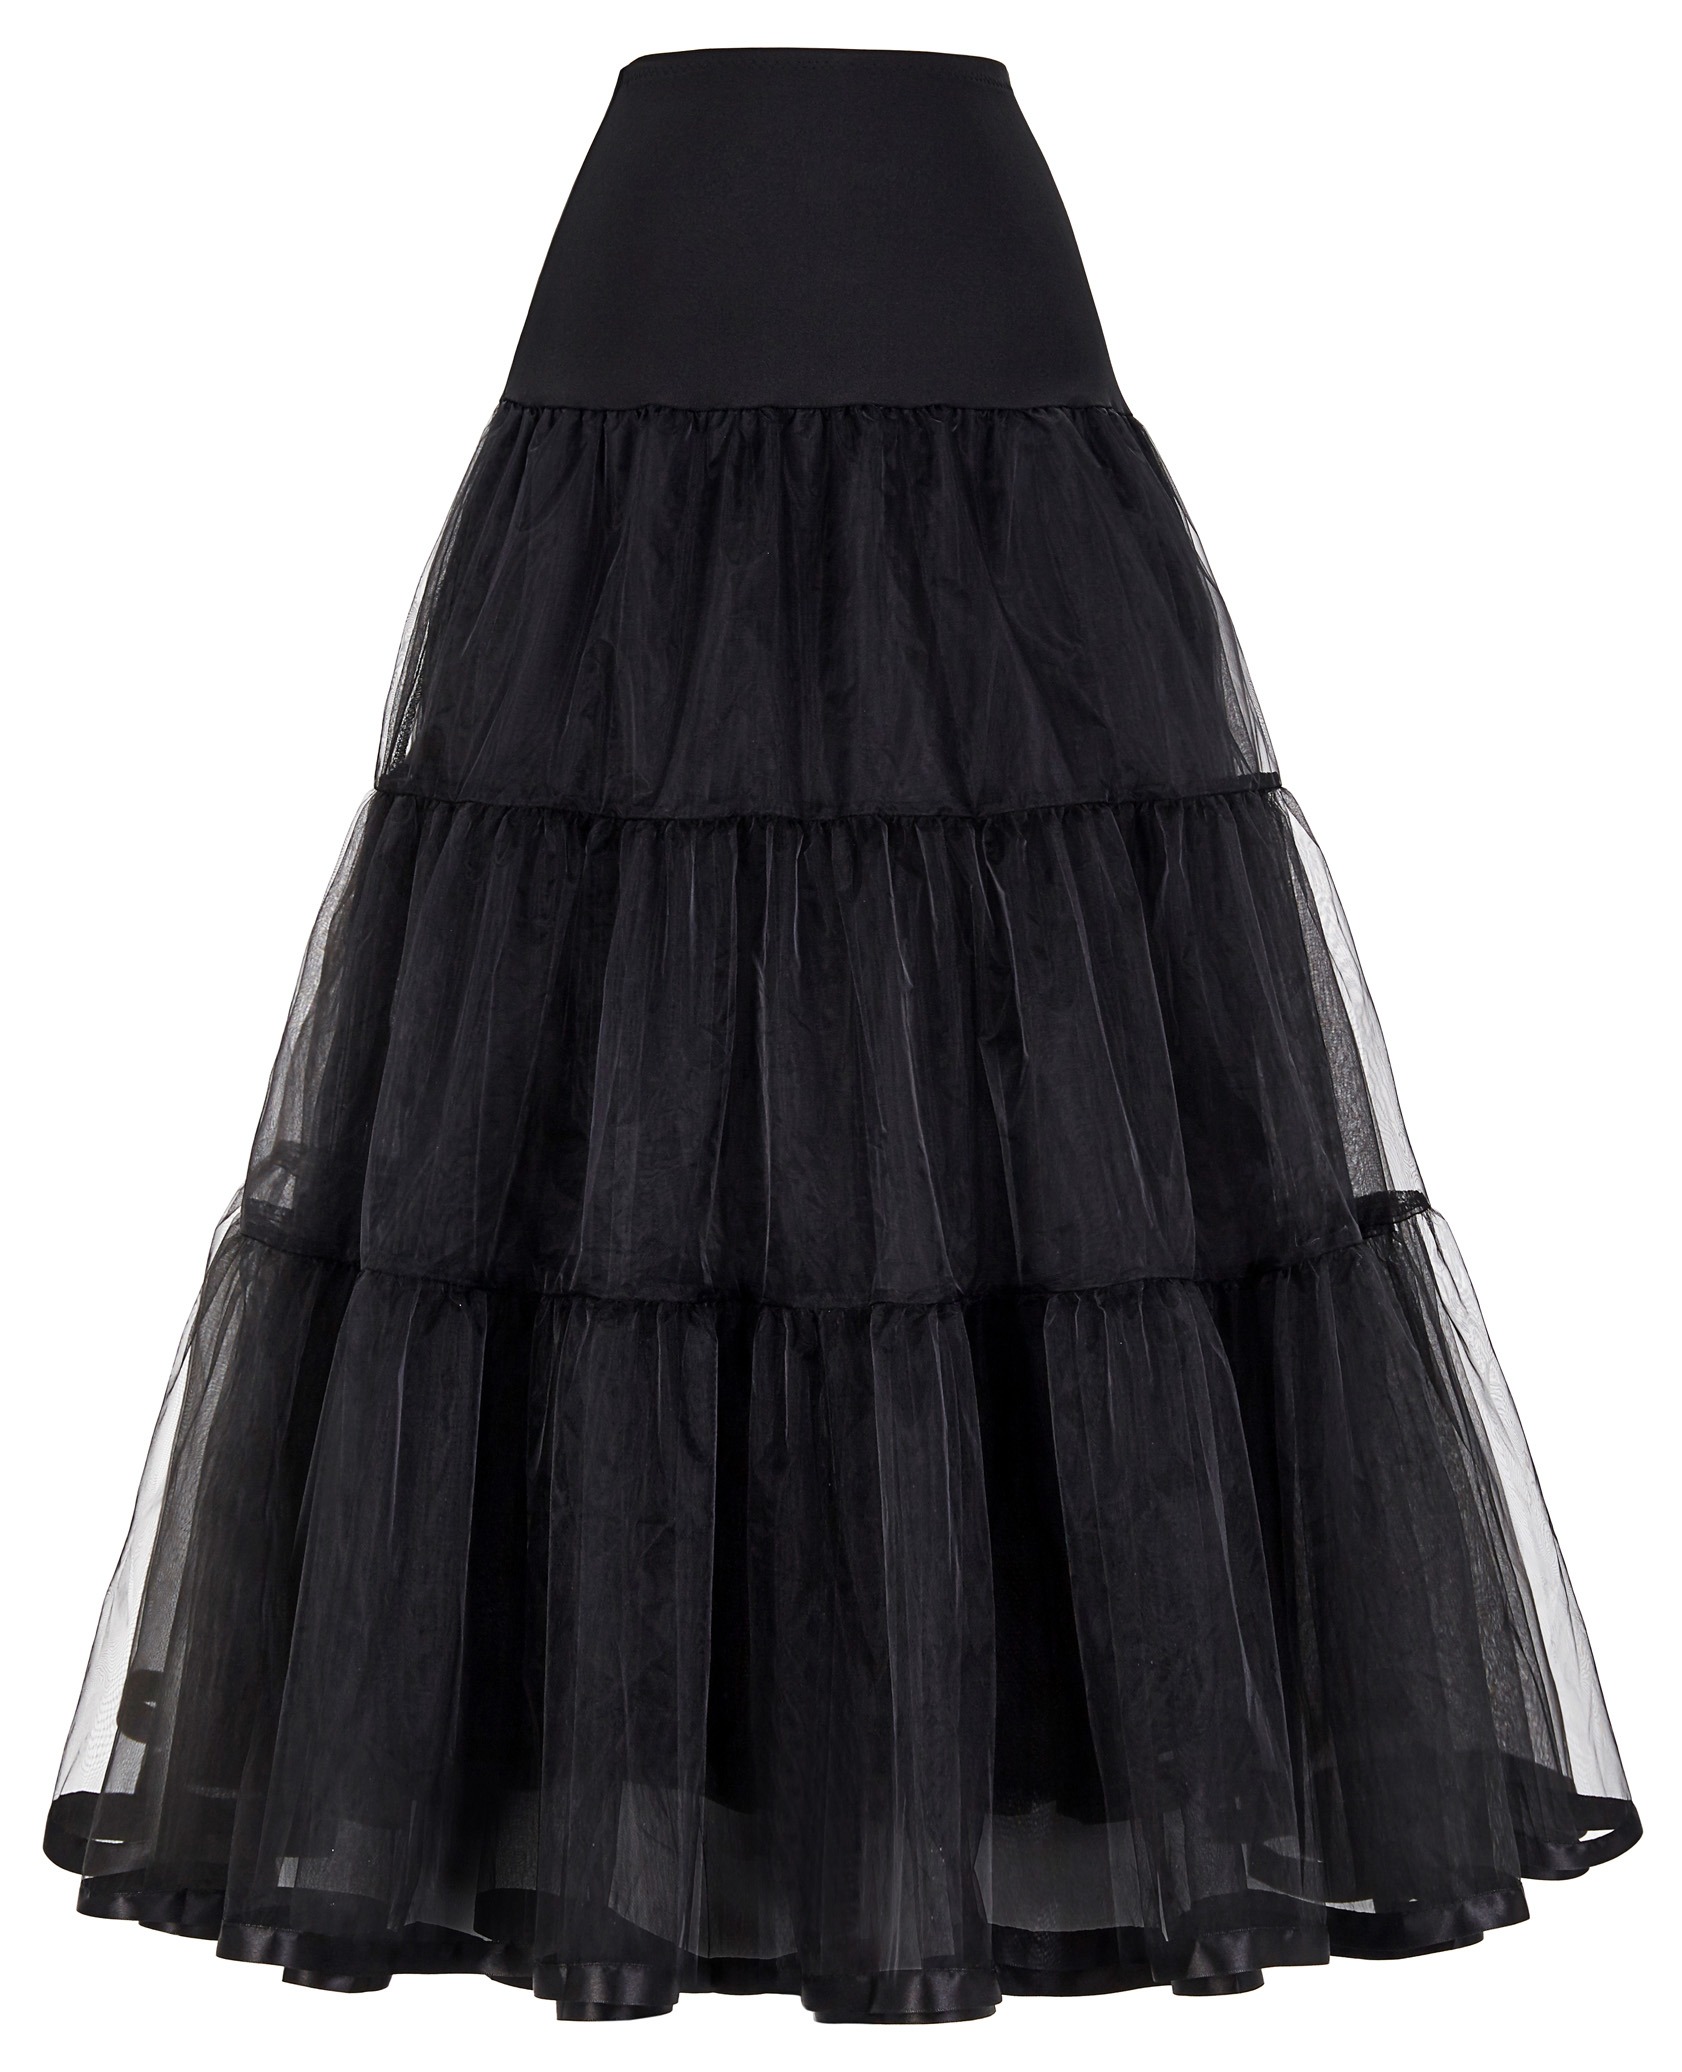 GK Long Skirt Women Retro Vintage High Waist Solid Color Elegant Skater Crinoline Petticoat Underskirt Ladies Party Skirts Falda